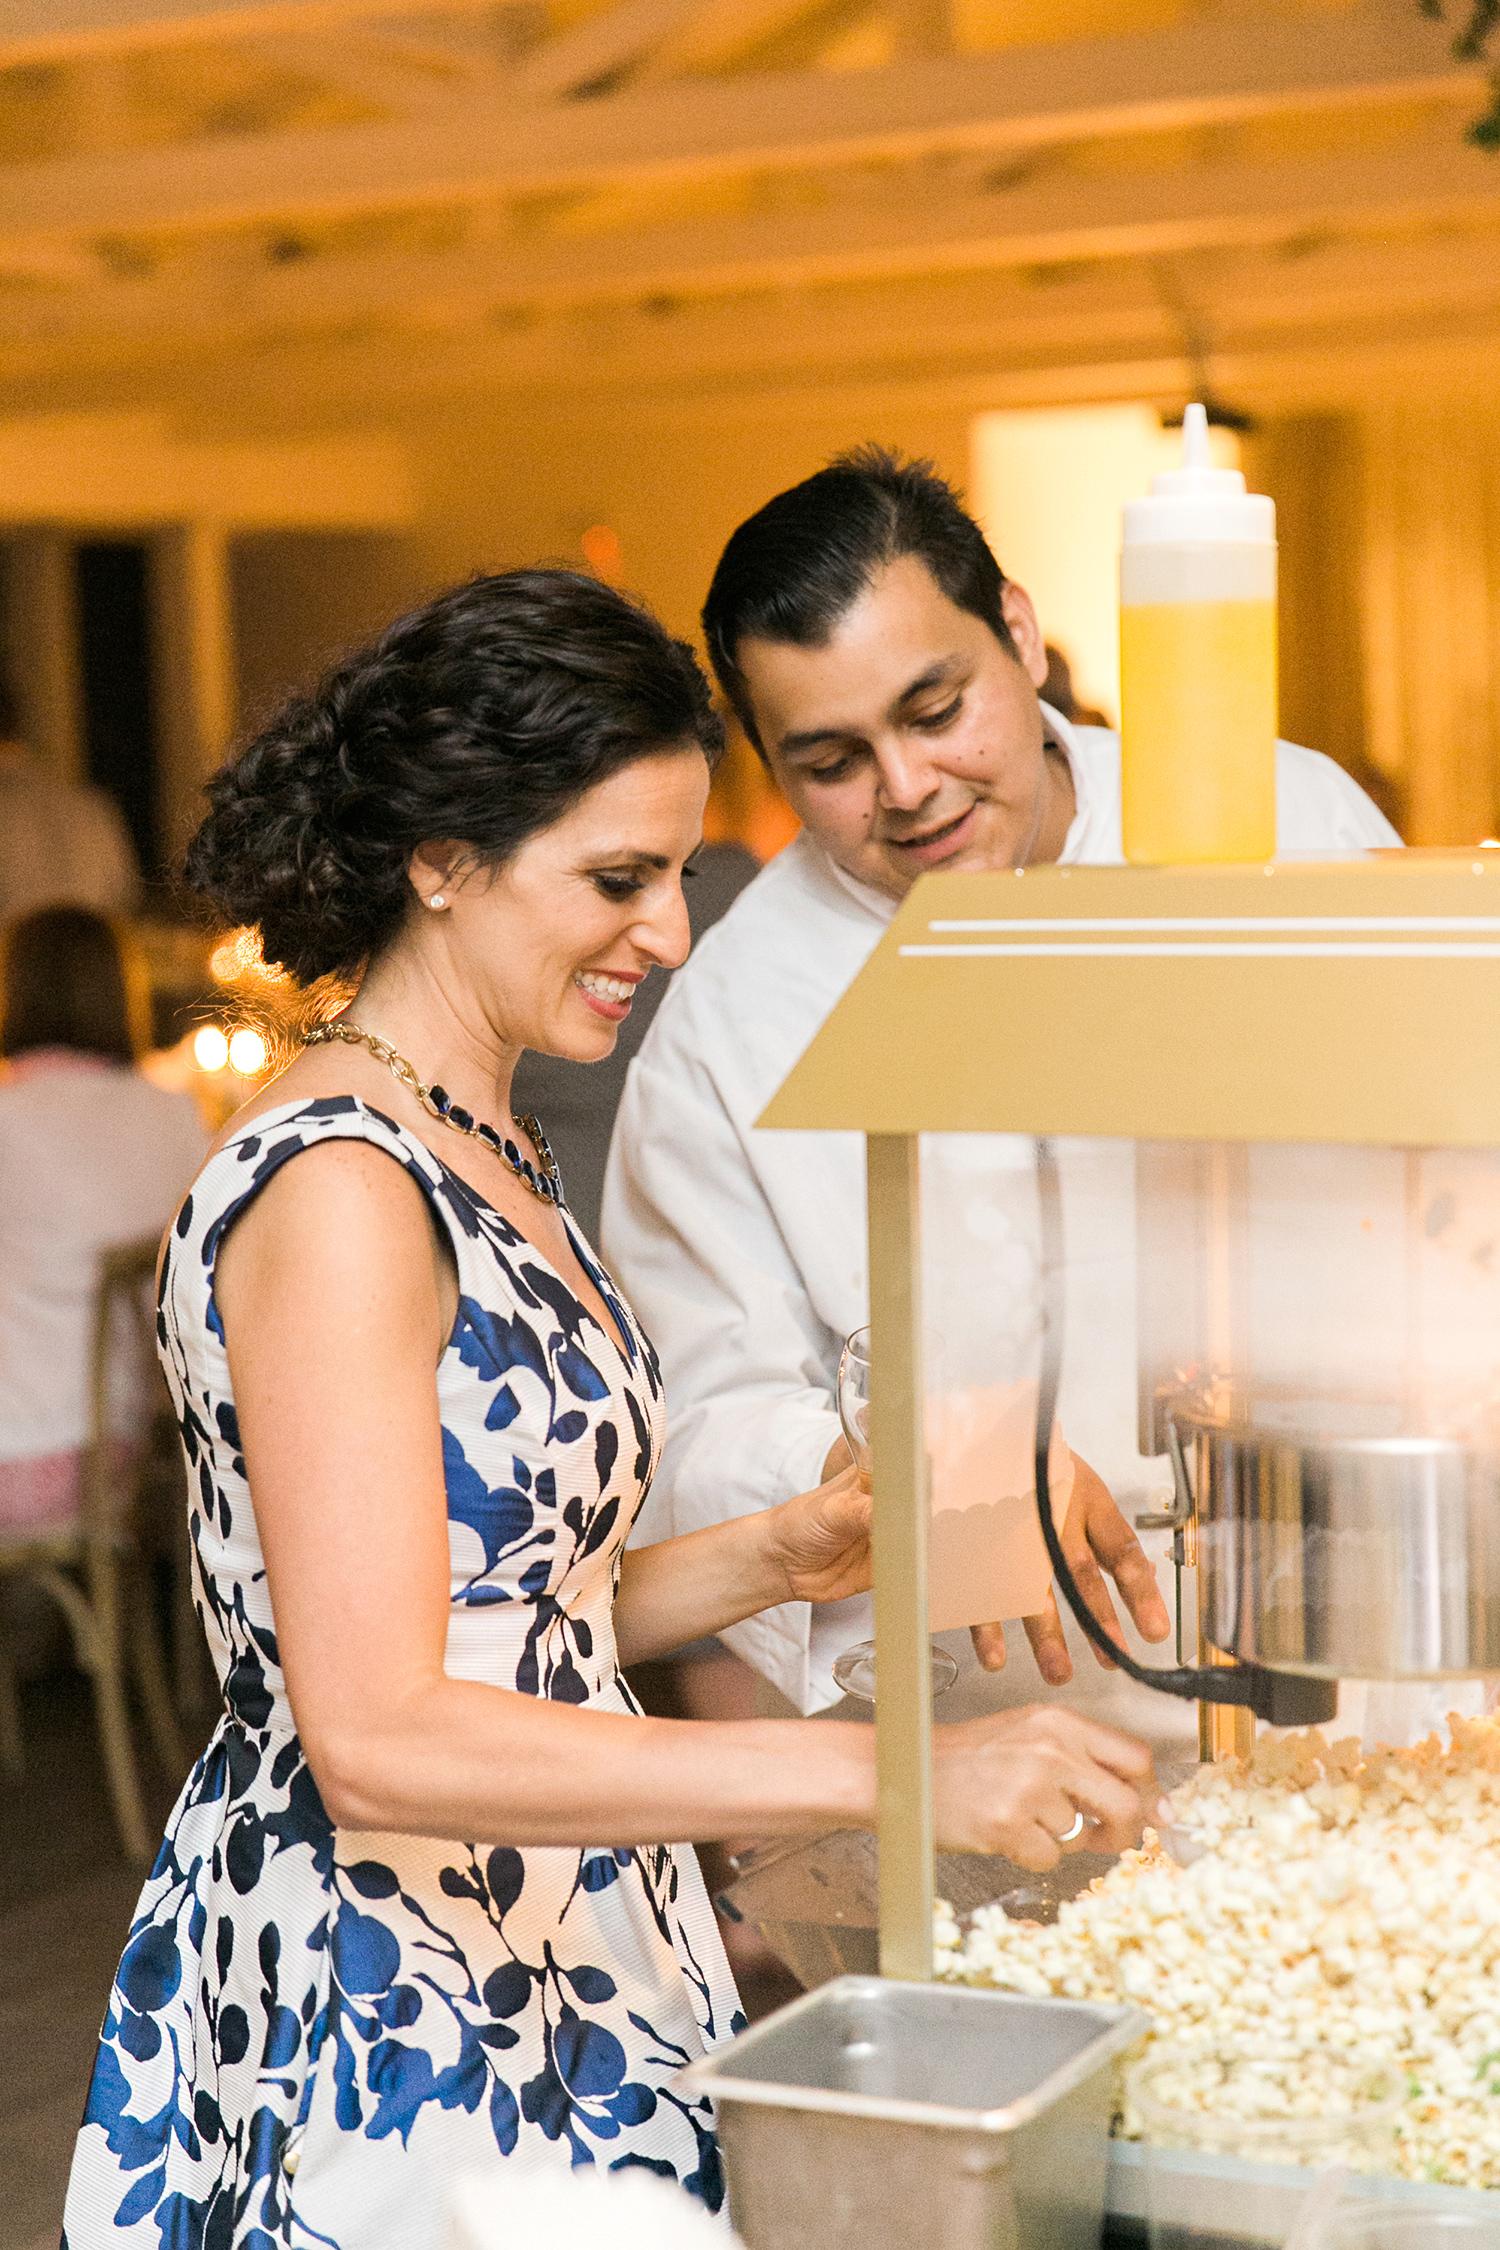 cassandra jason wedding guests with popcorn